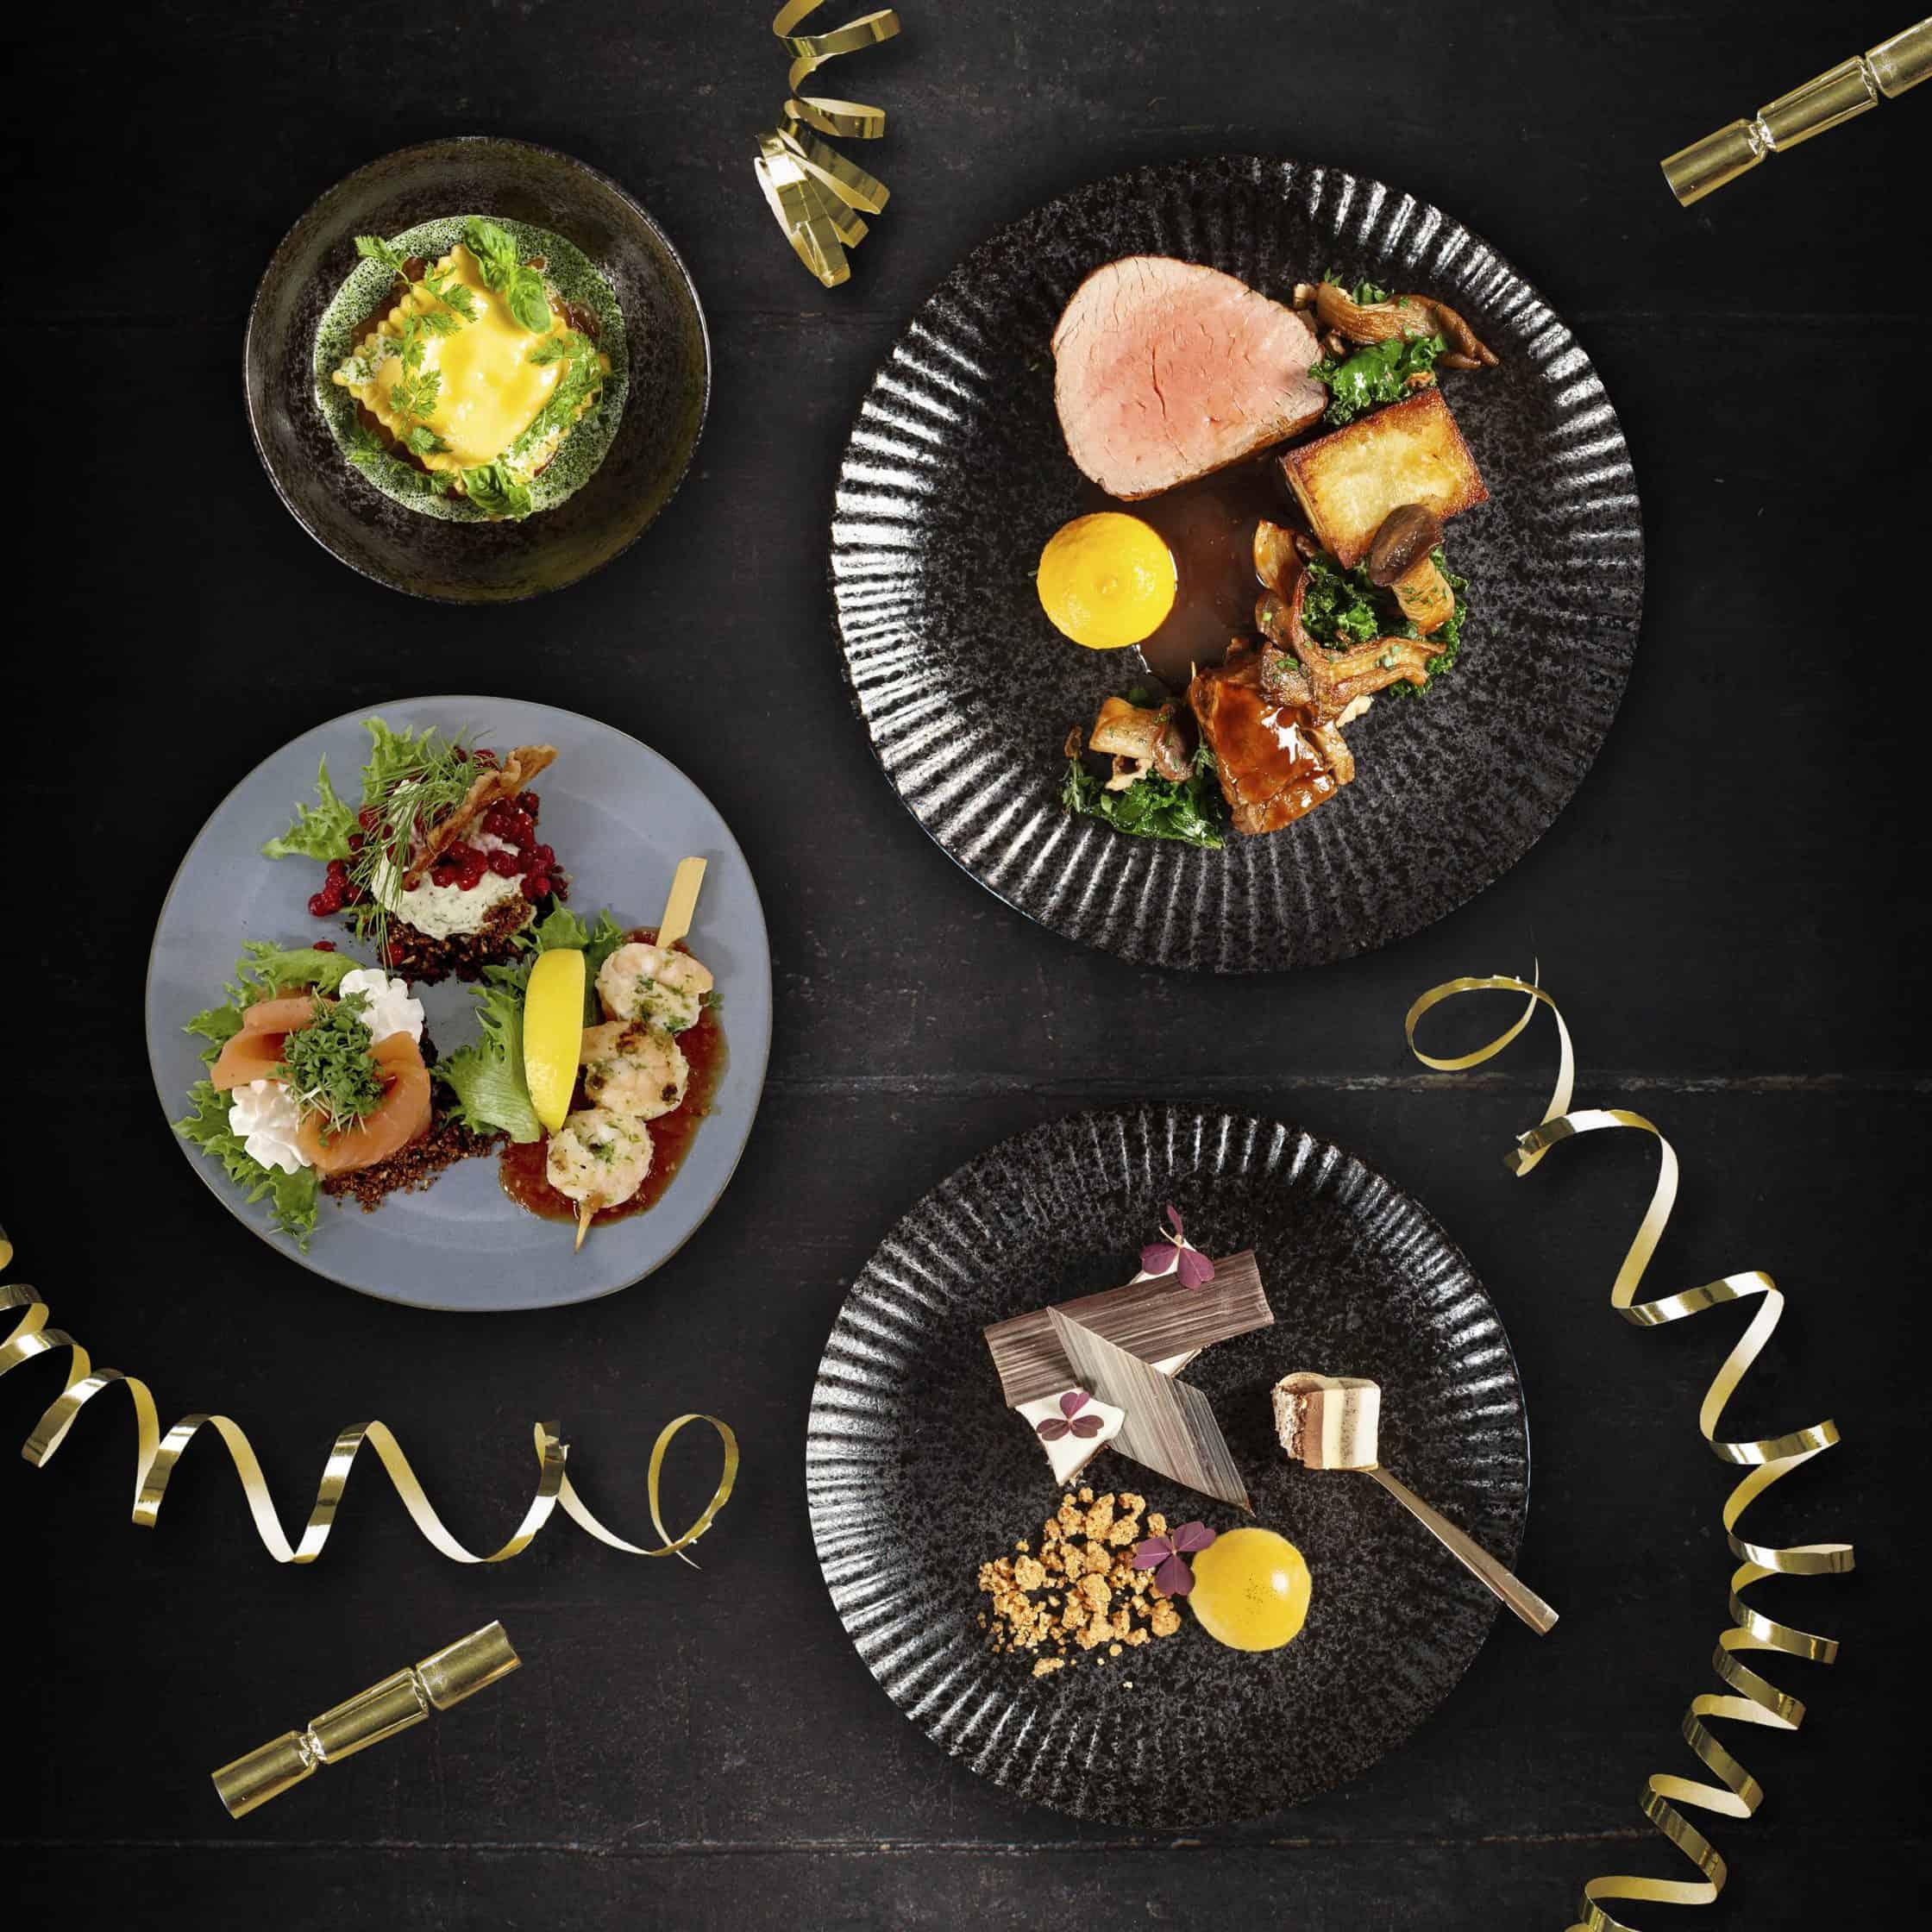 Nytarsmenu 2020 Frederiksborg Catering